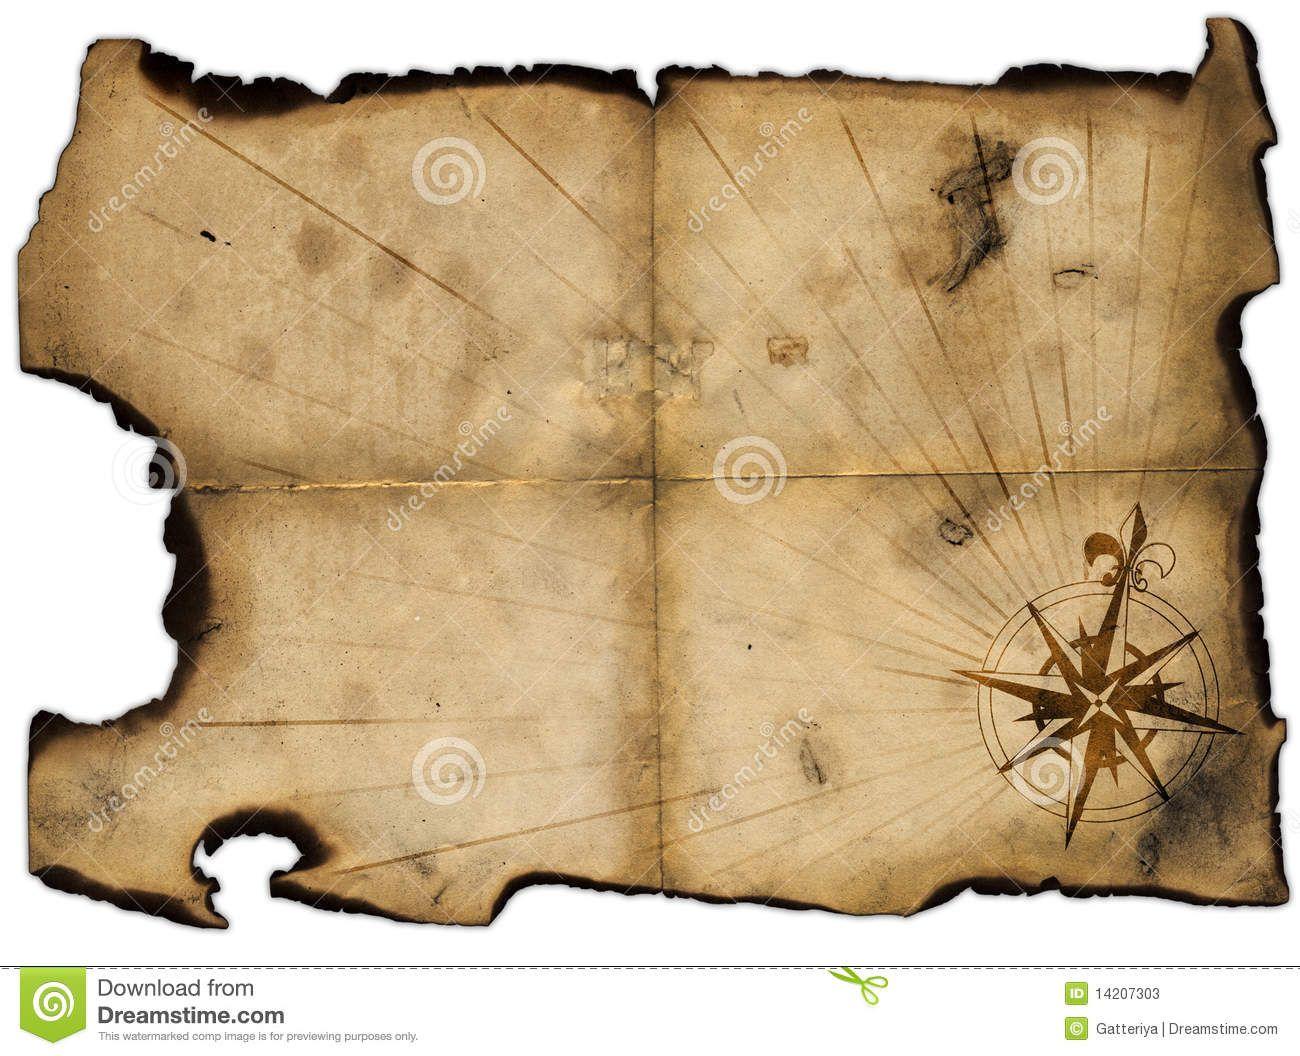 Treasure Map Template blank treasure map template   videotekaalex.tk | Kids Crafts  Treasure Map Template